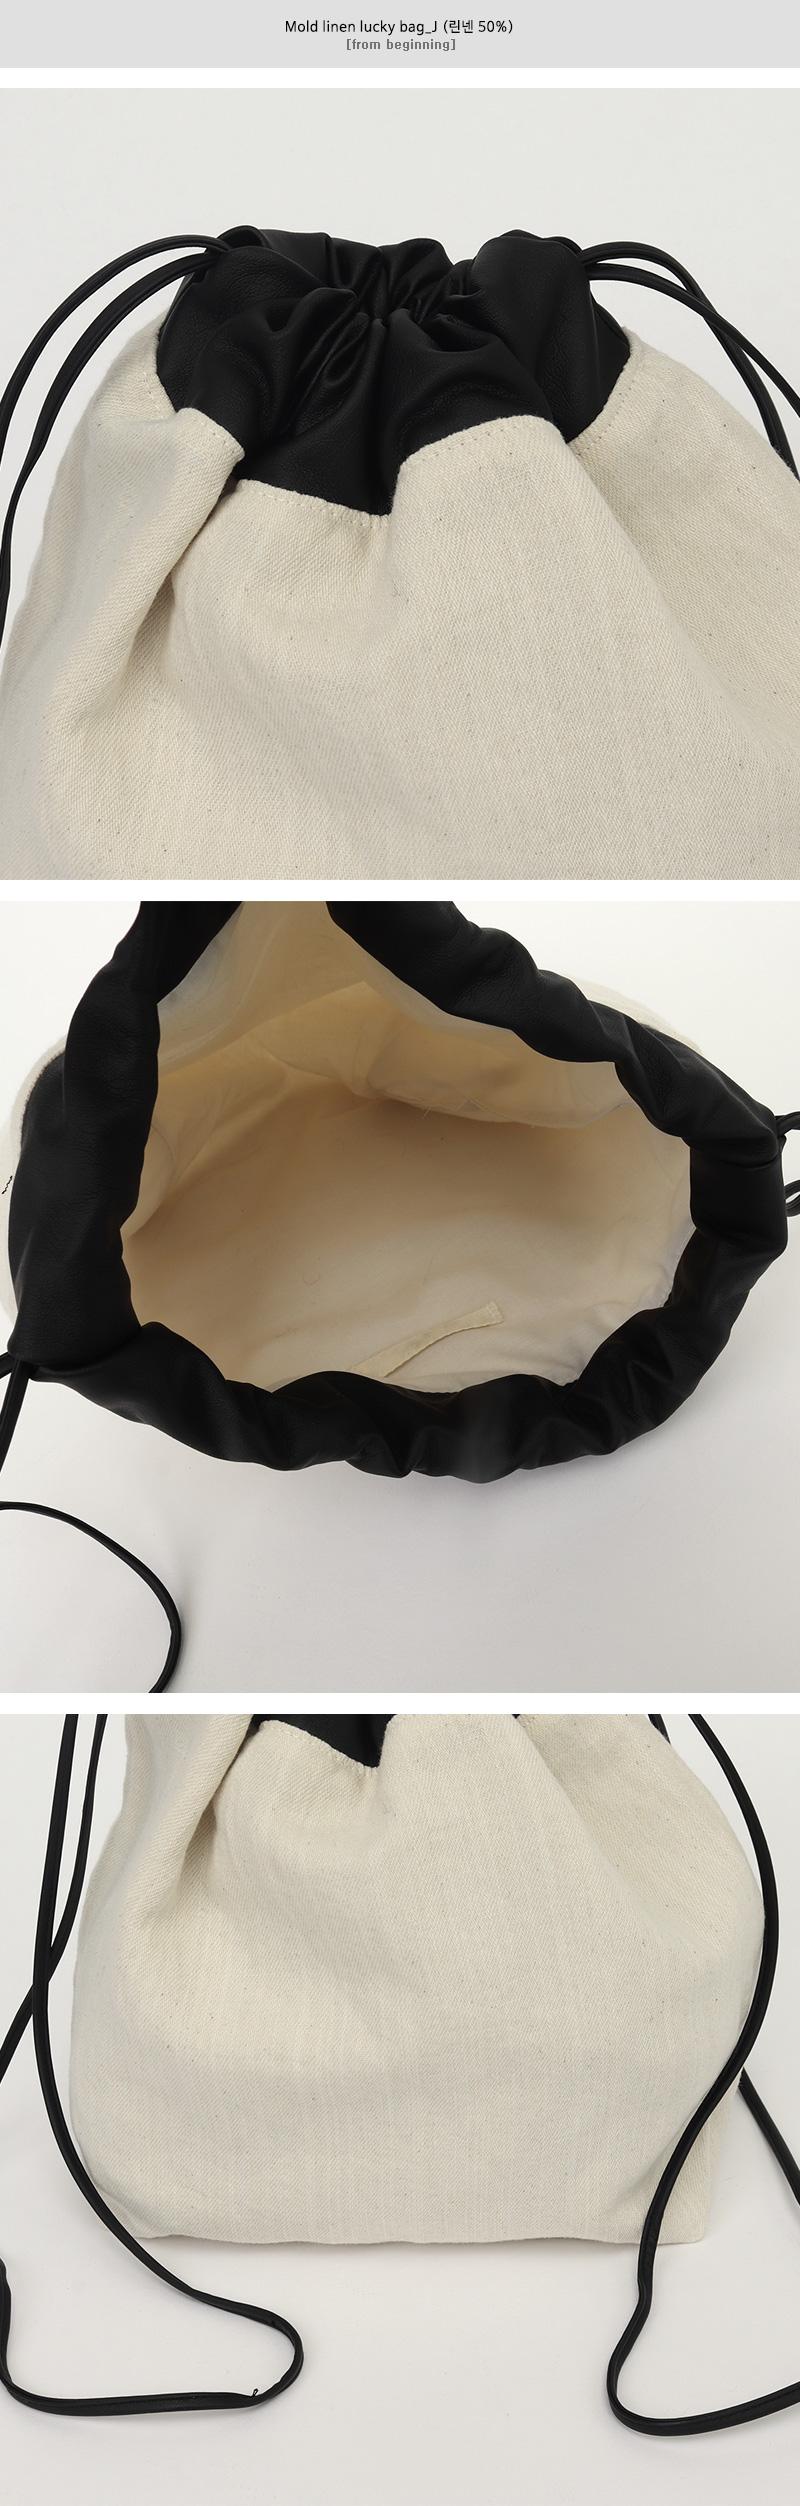 Mold linen lucky bag_J  (size : one)